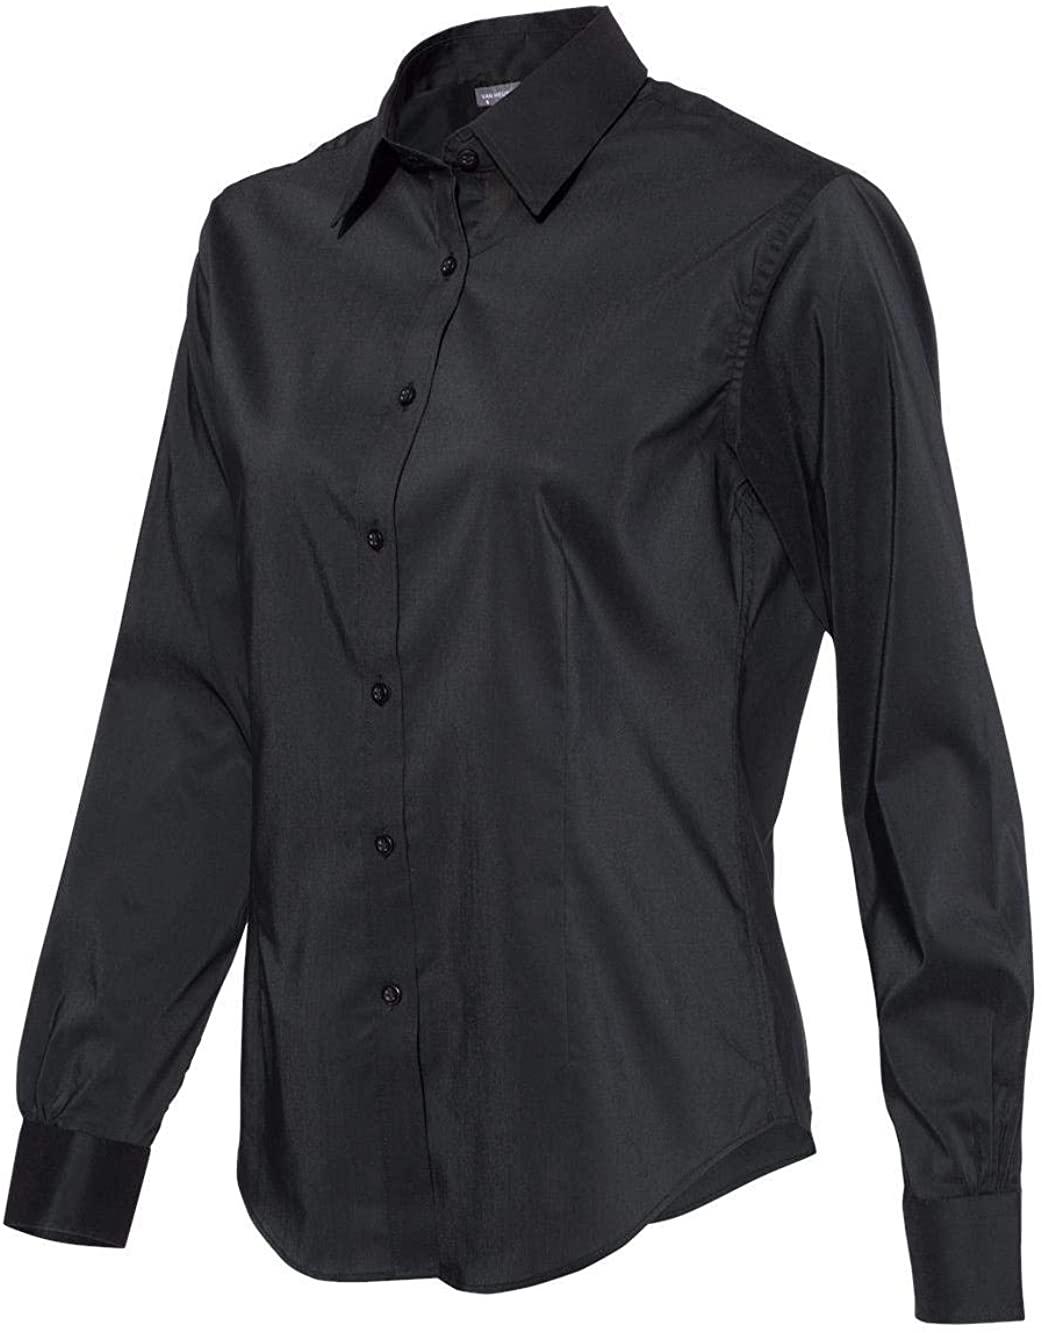 Van Heusen - Women's Stretch Spread Collar - 13V5050 - XL - Deep Black